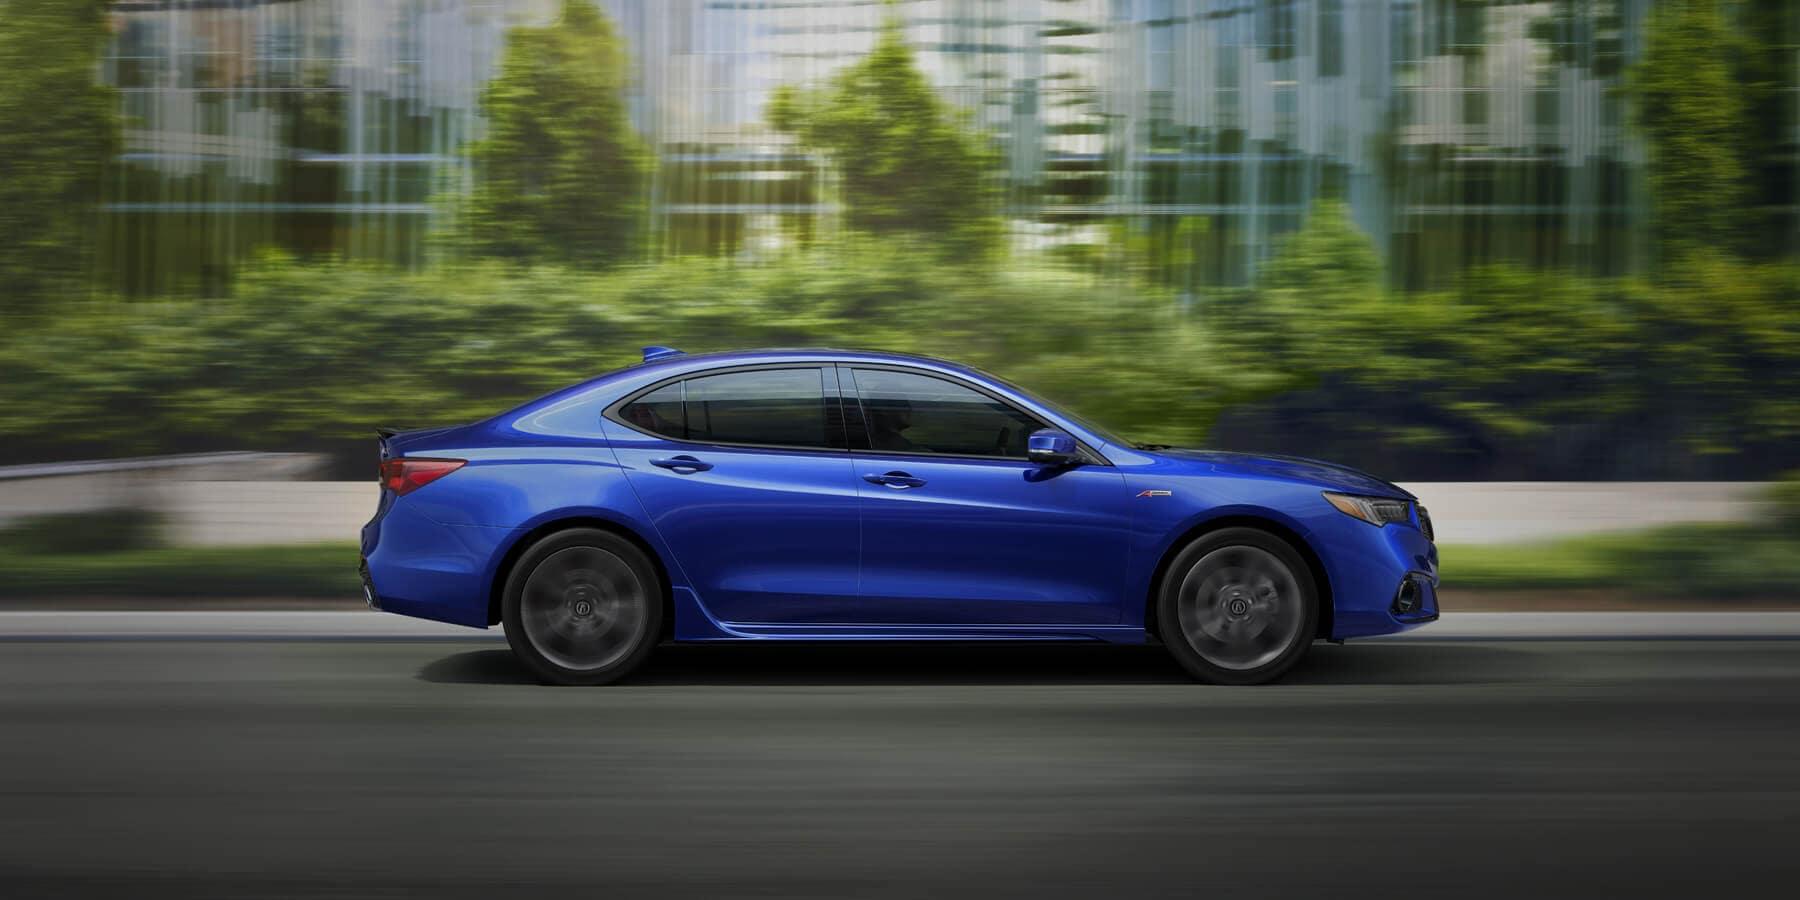 2020 Acura TLX Apex Blue Pearl Side Profile